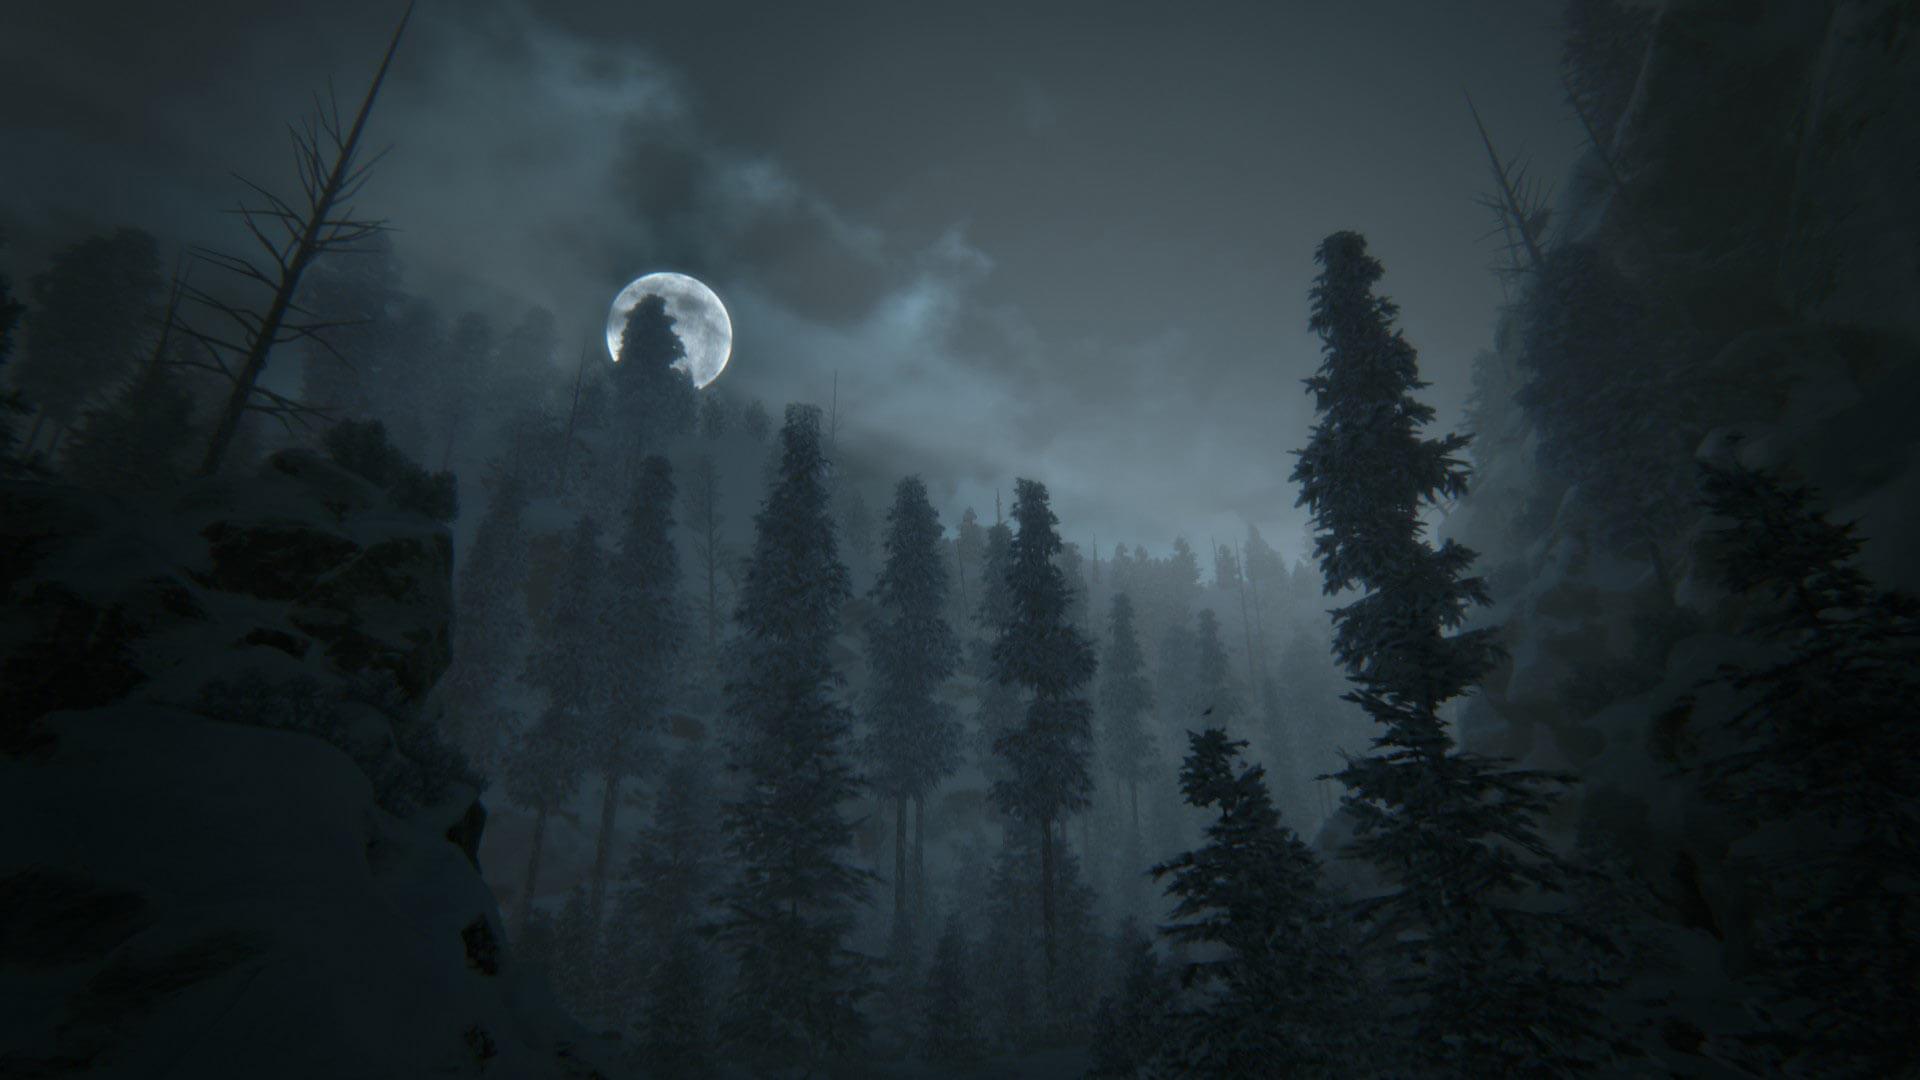 Shiva Animated Wallpaper Hd Dyatlov Pass Horror Title Kholat Coming To Xbox One